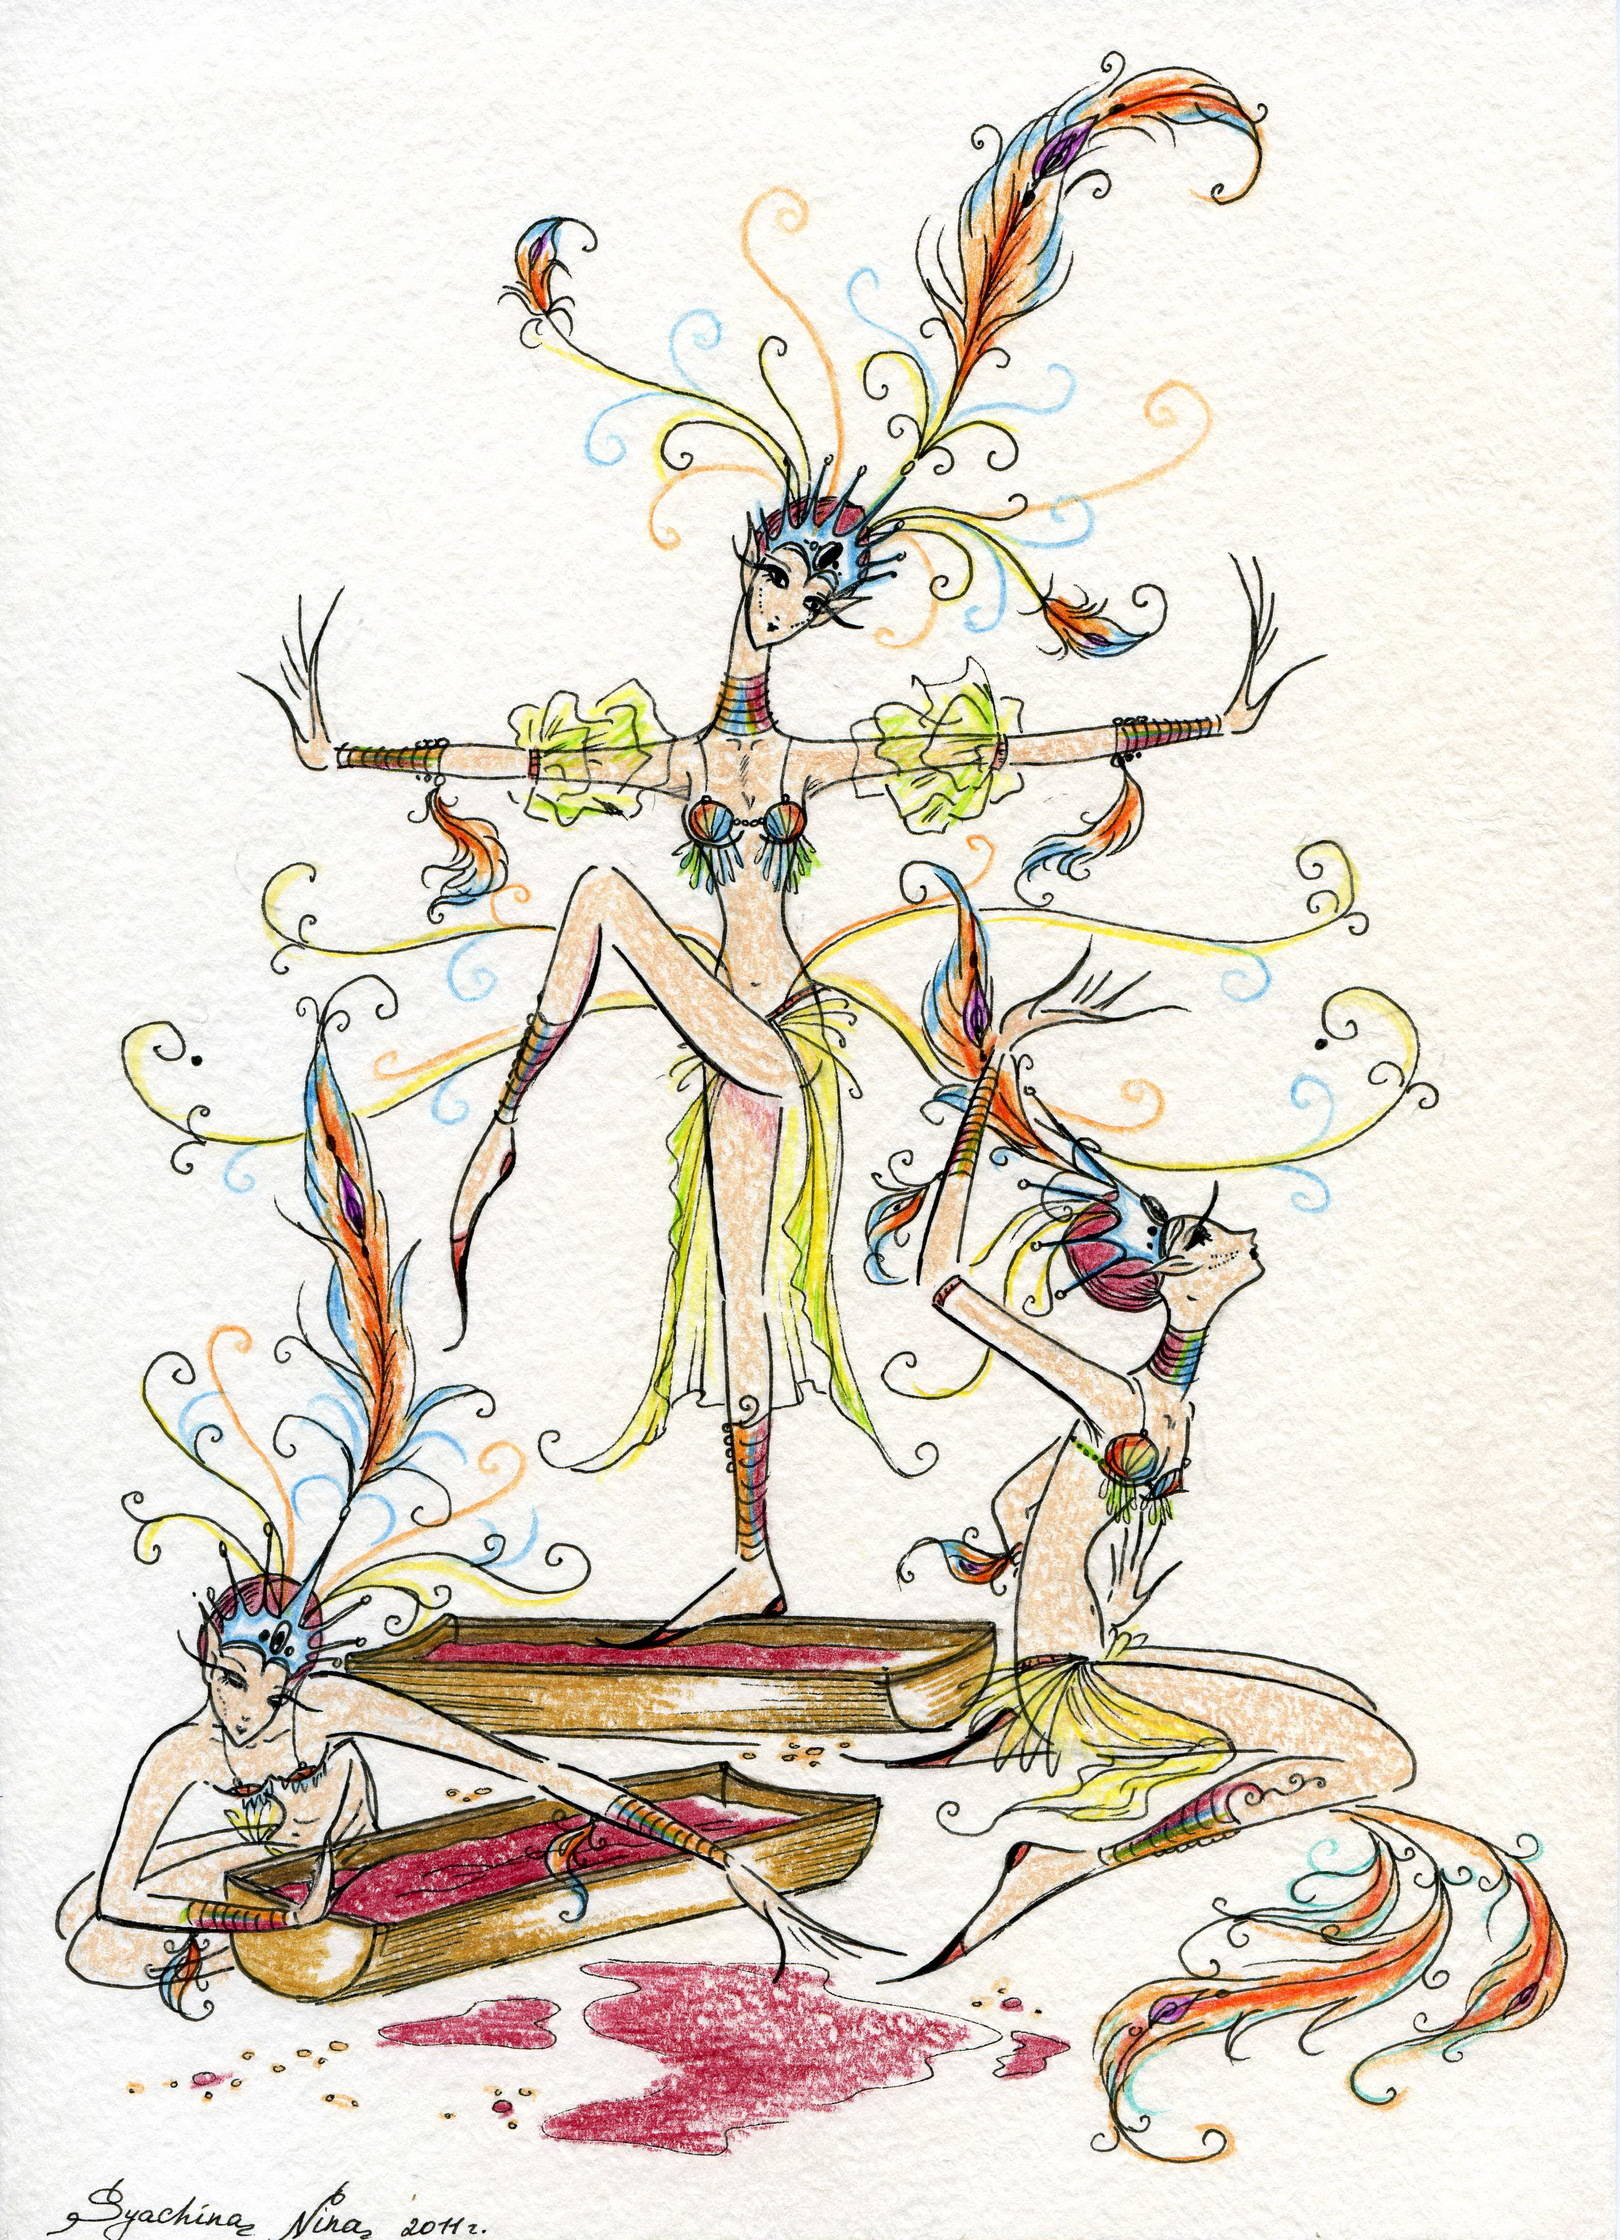 "иллюстрация к сказке Ершова ""Конёк-Горбунок"" (в виде балета, образ Жар-Птиц)"